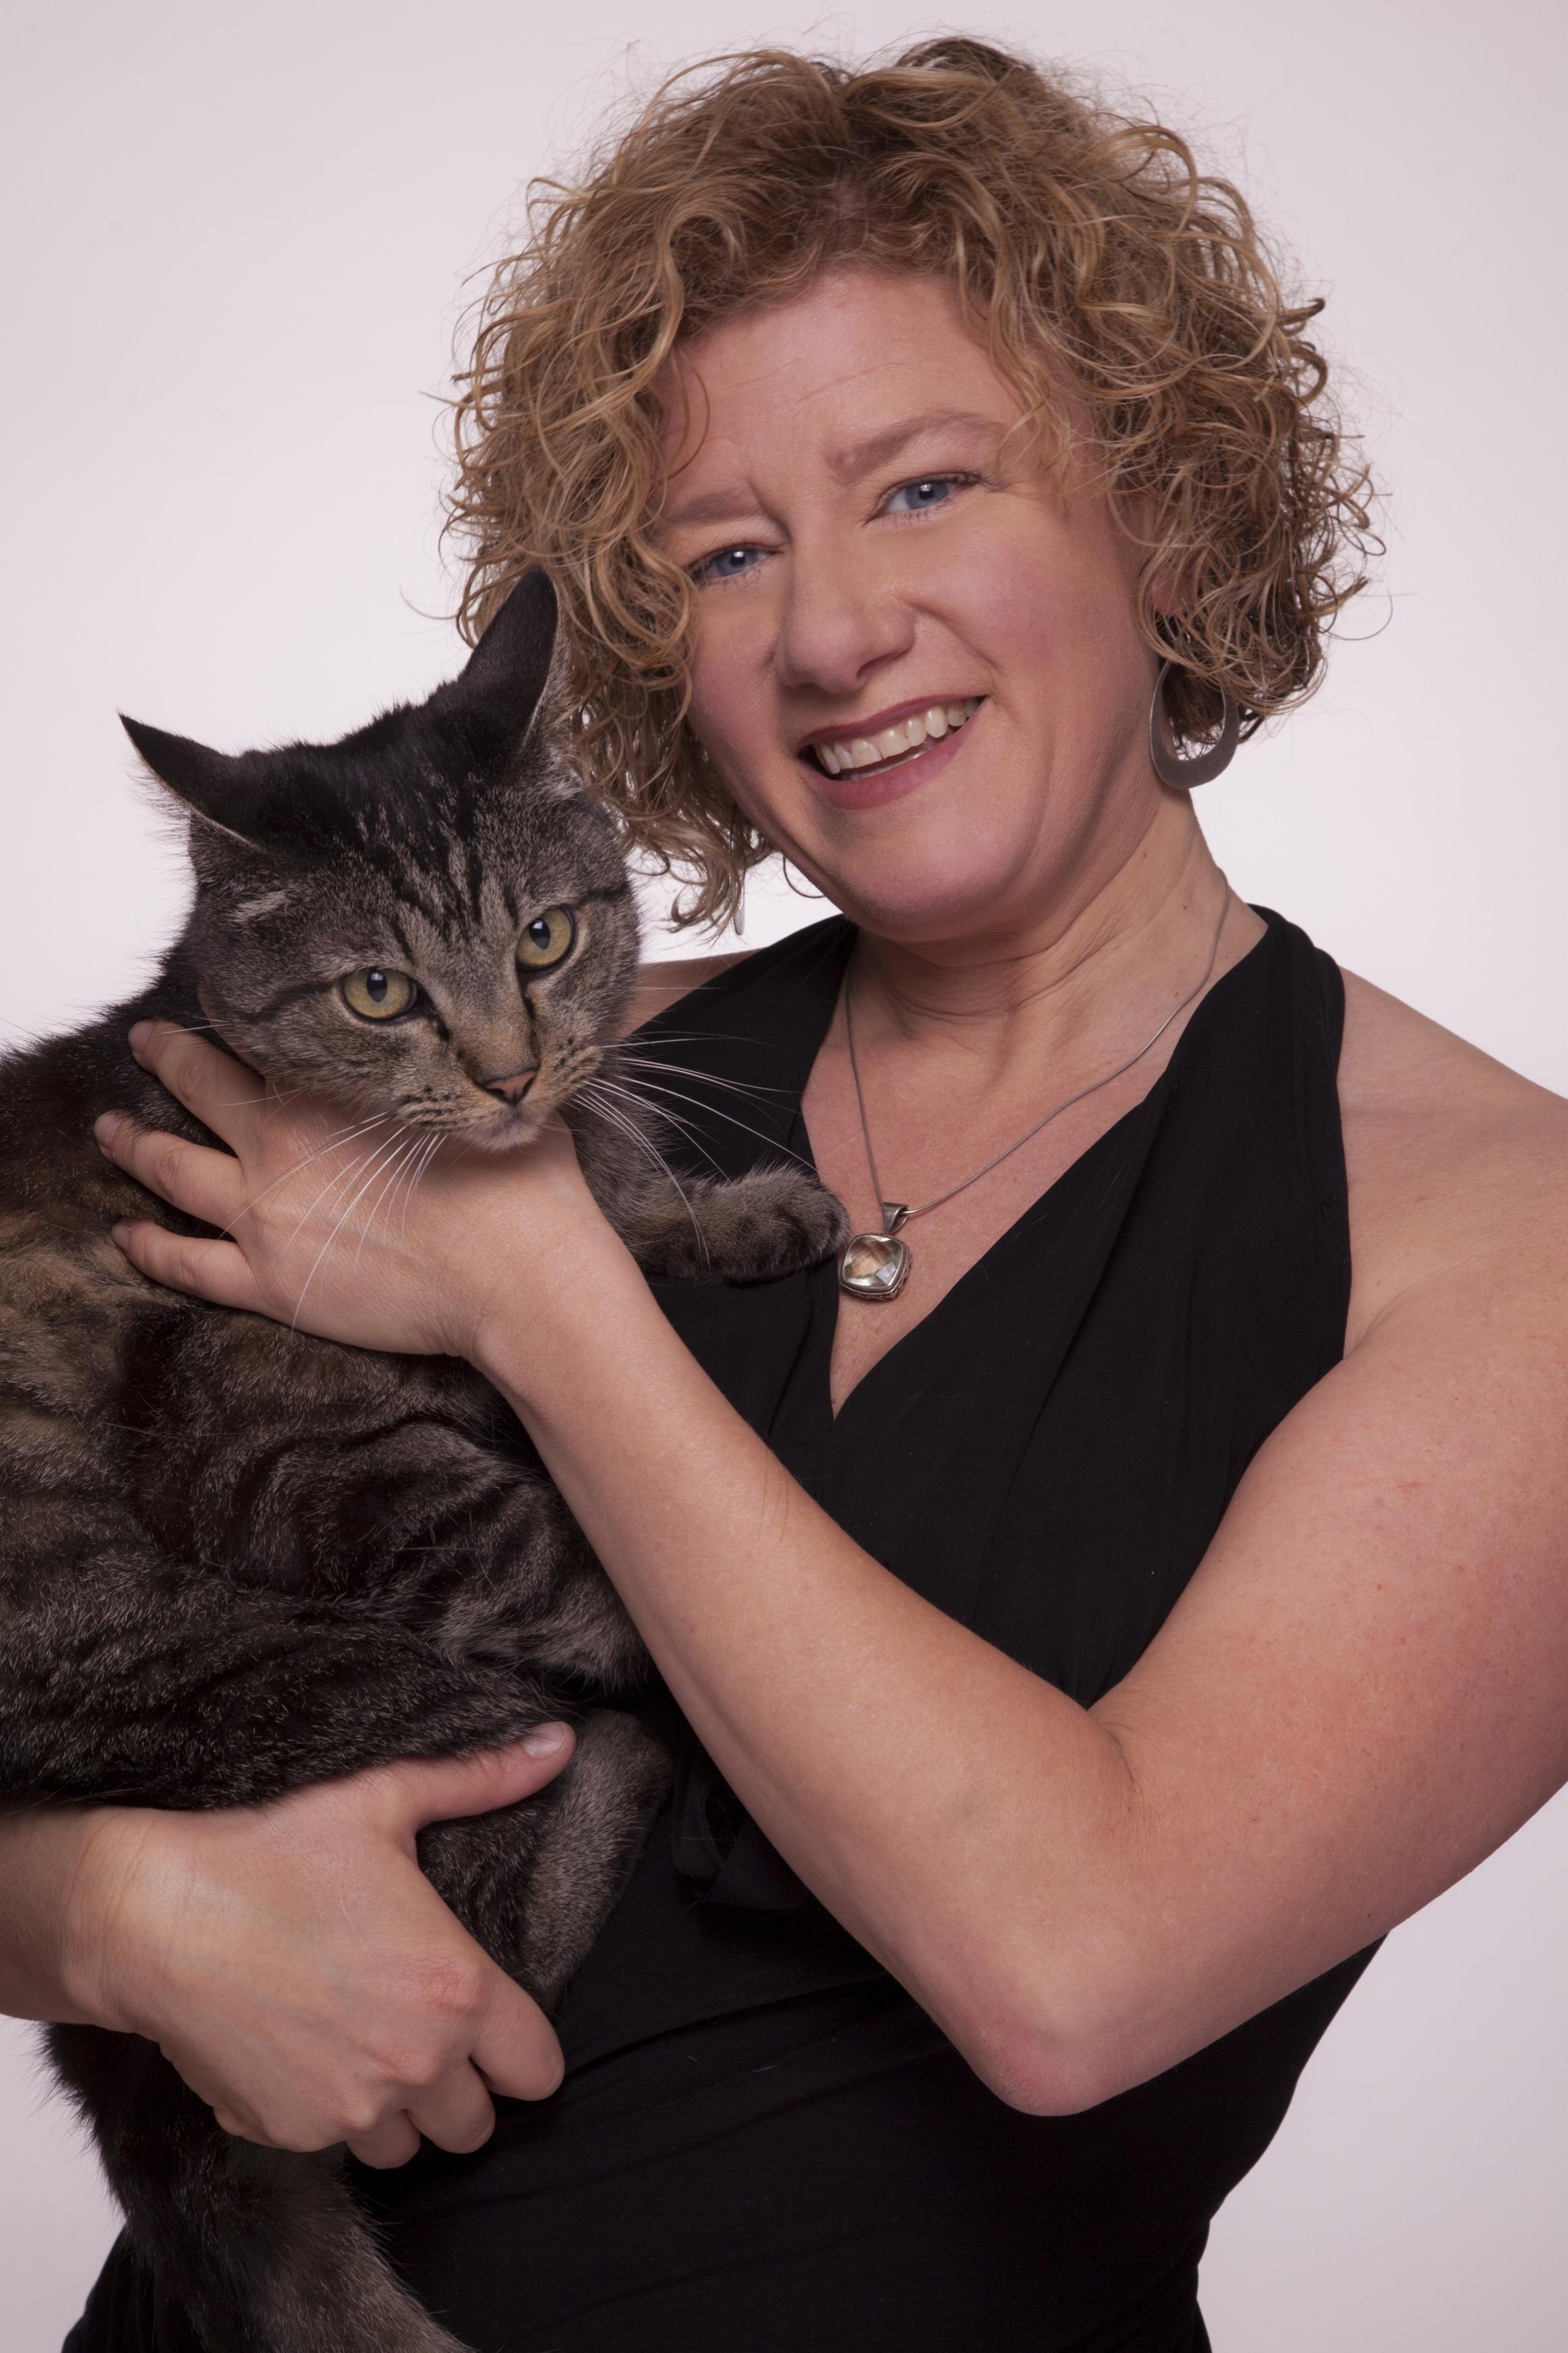 kim&cat.jpg